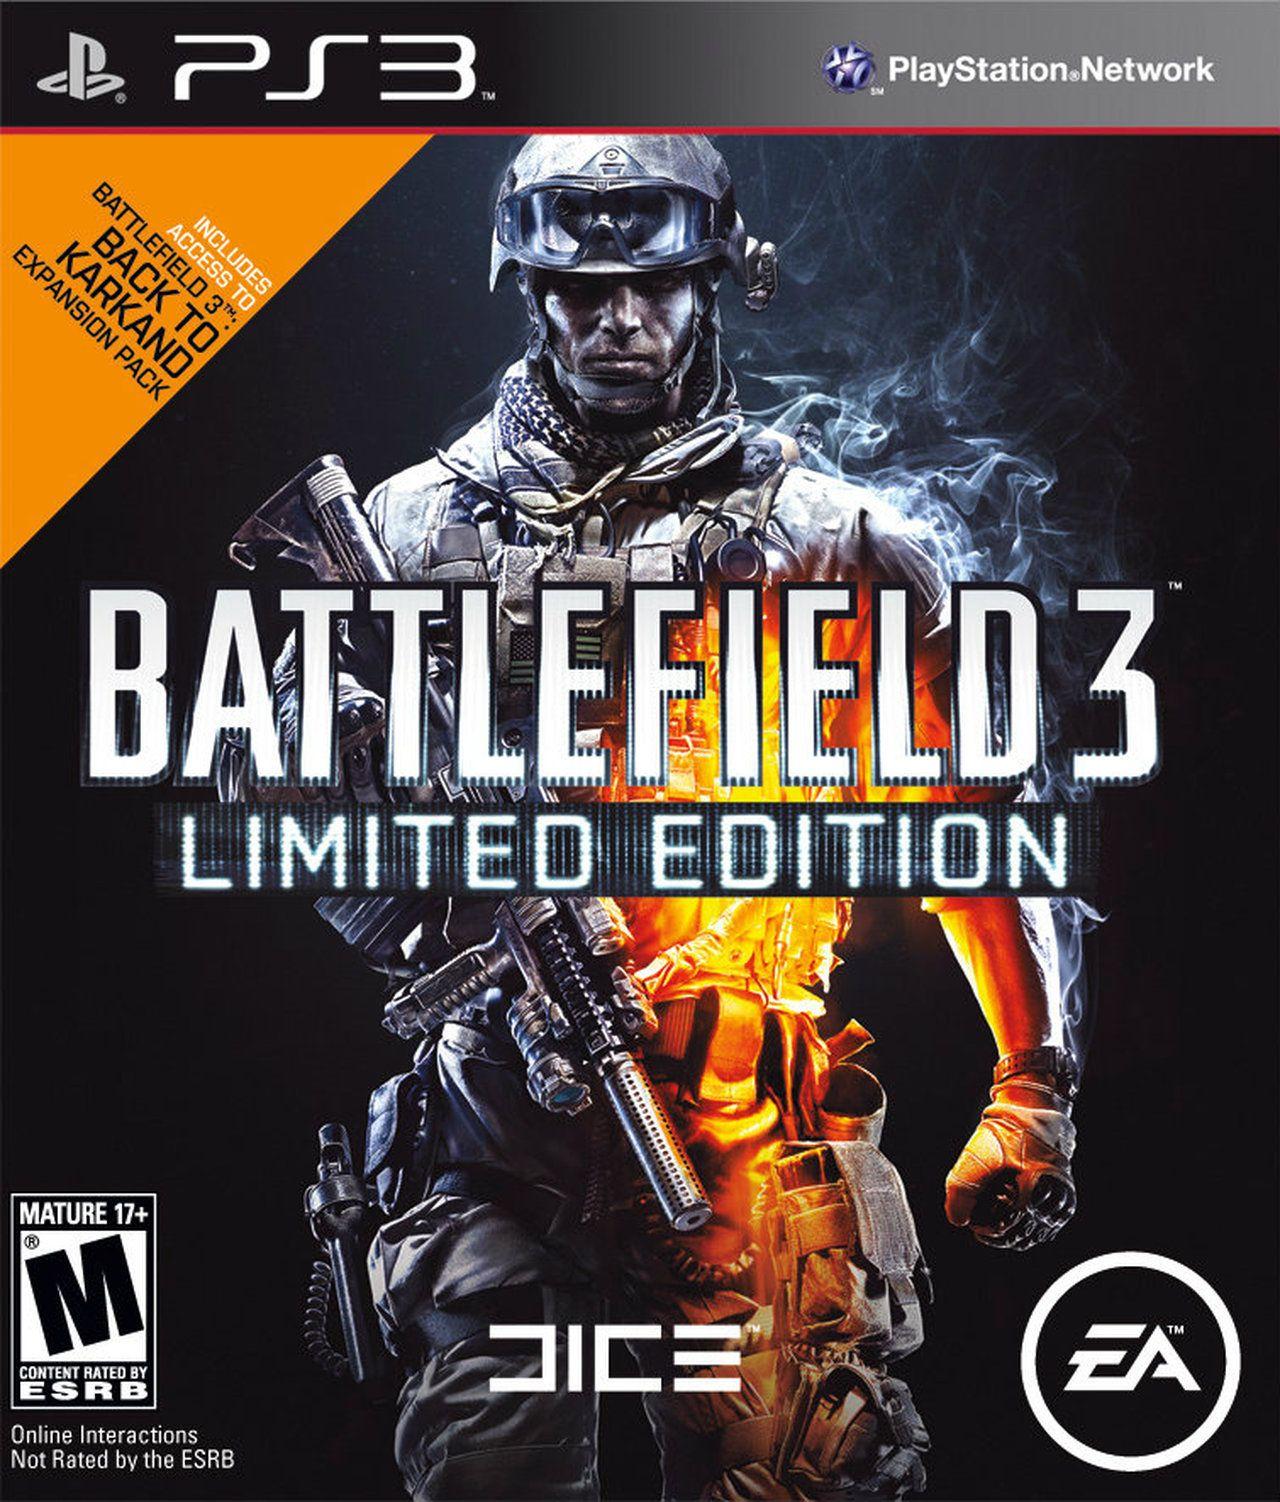 Pin by Aaron Viles on Video Game Series Battlefield 3